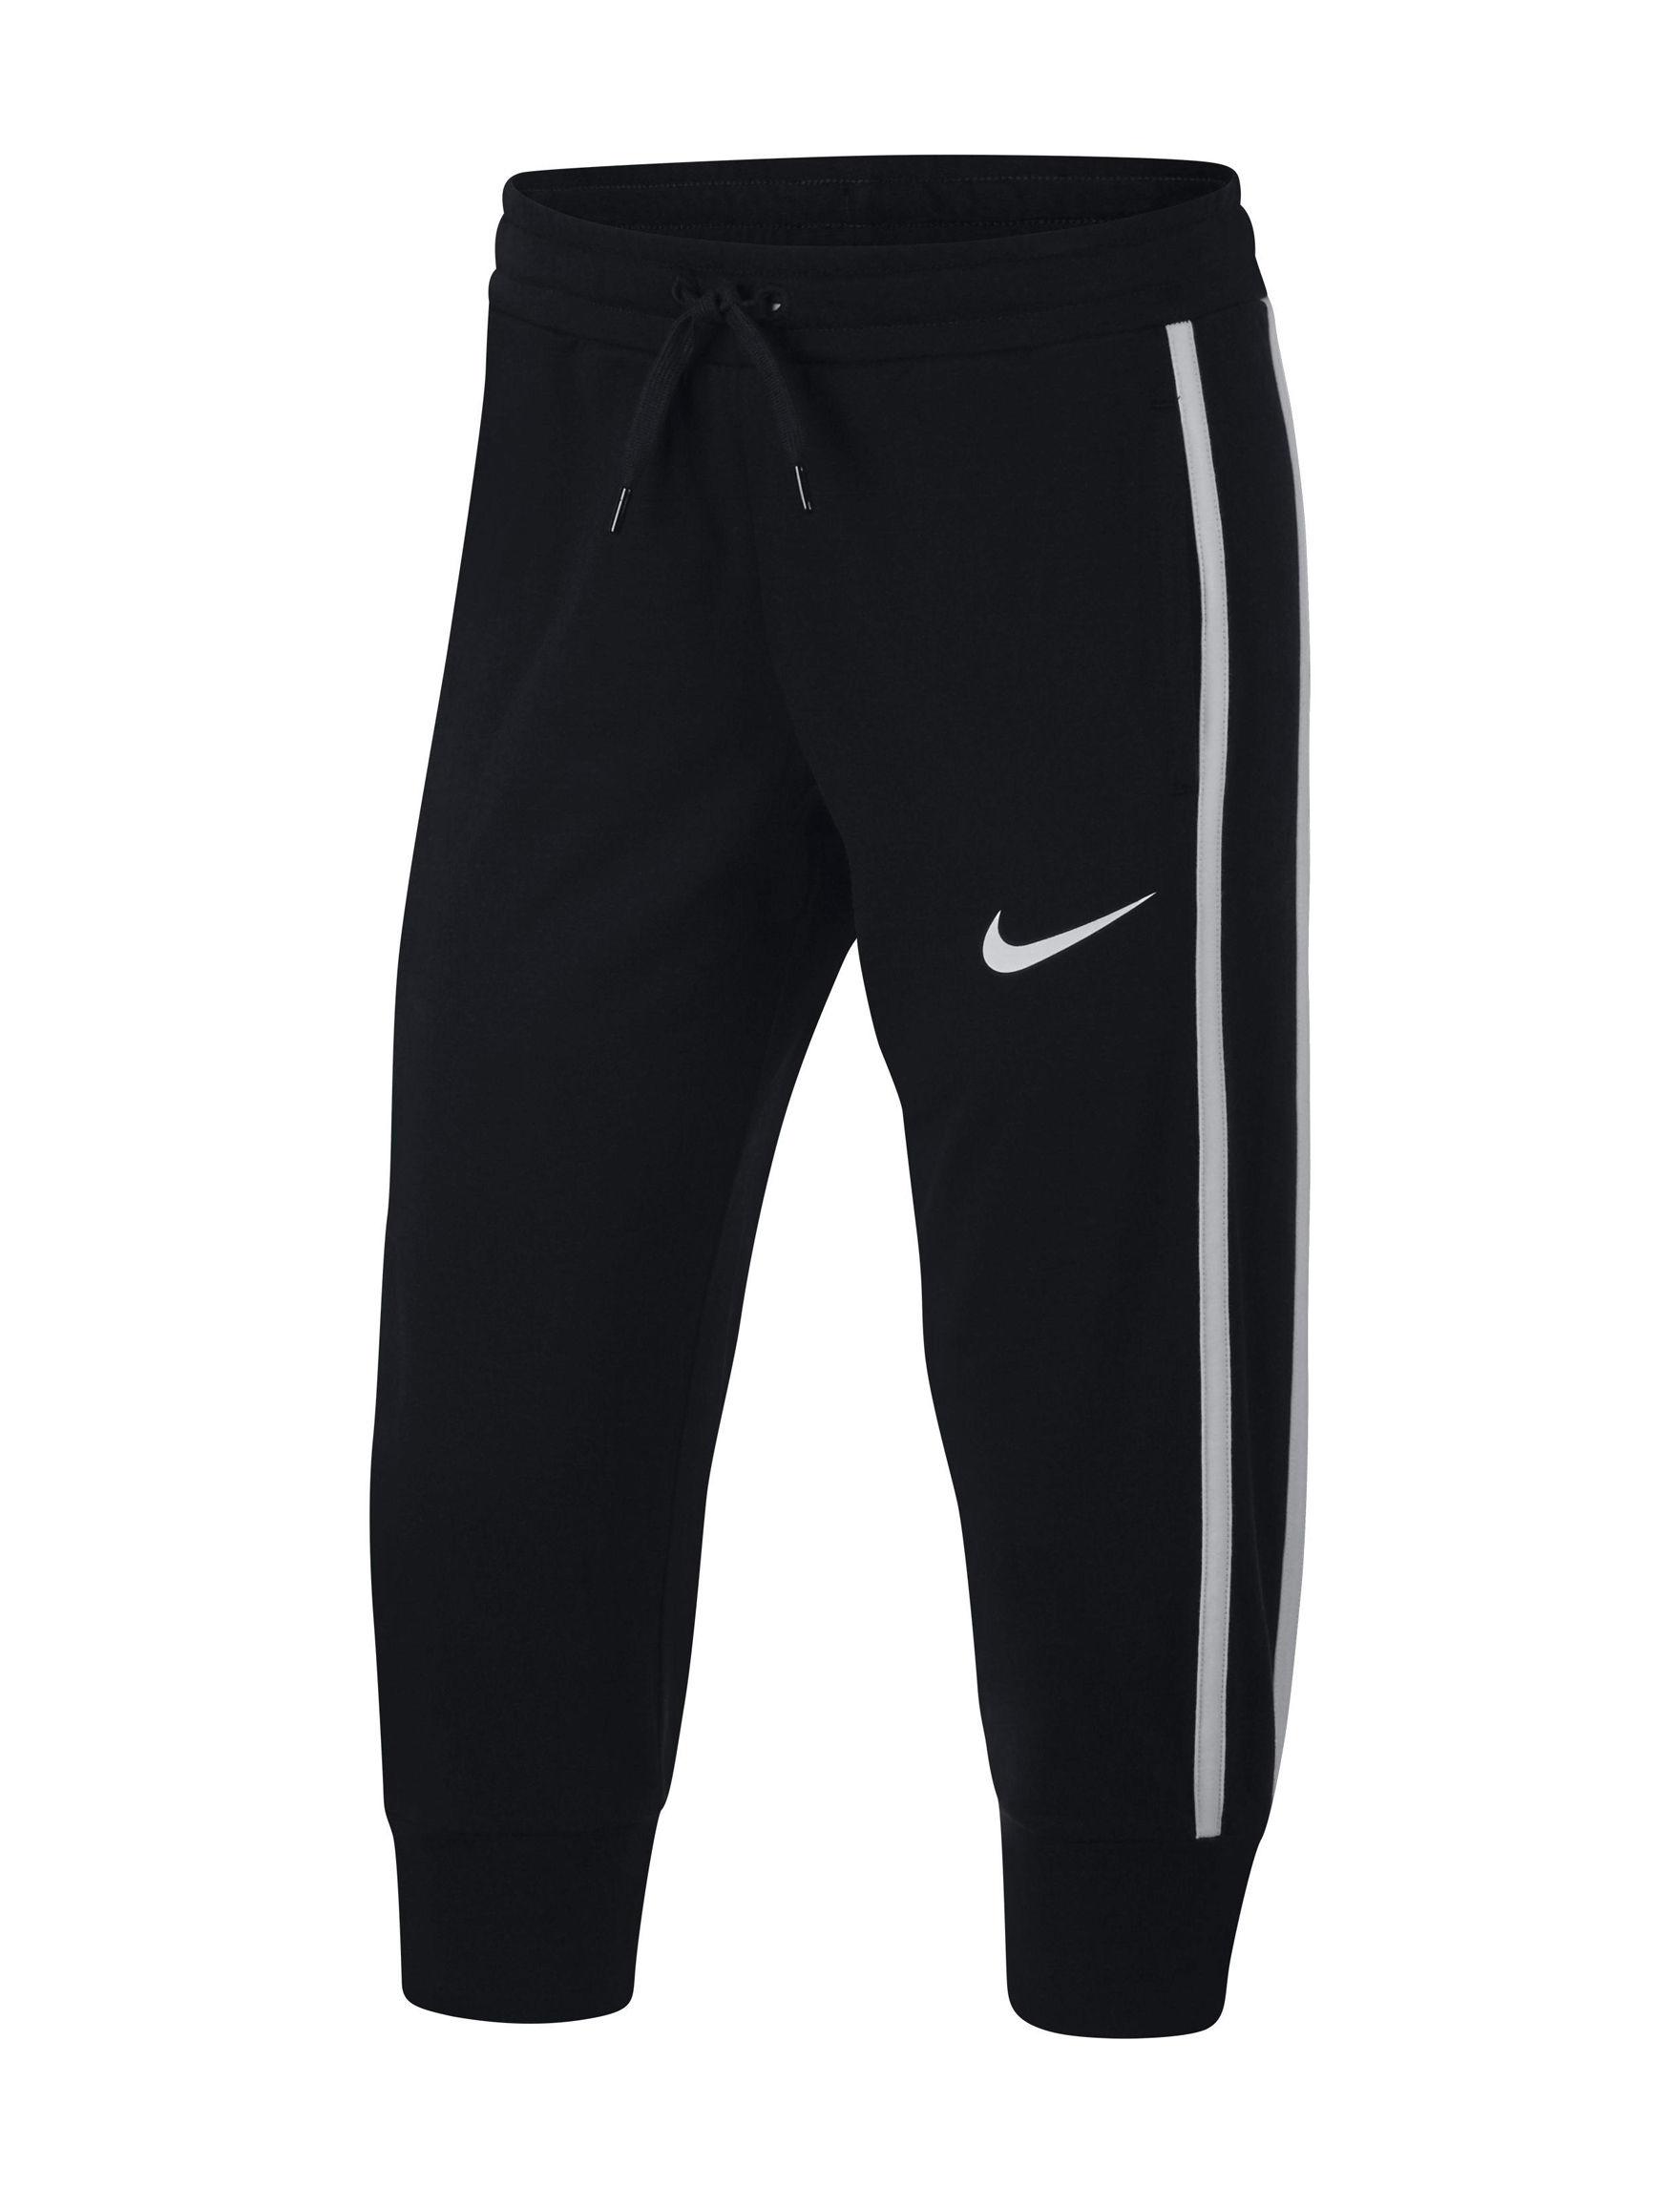 Nike Black Nightgowns & Sleep Shirts